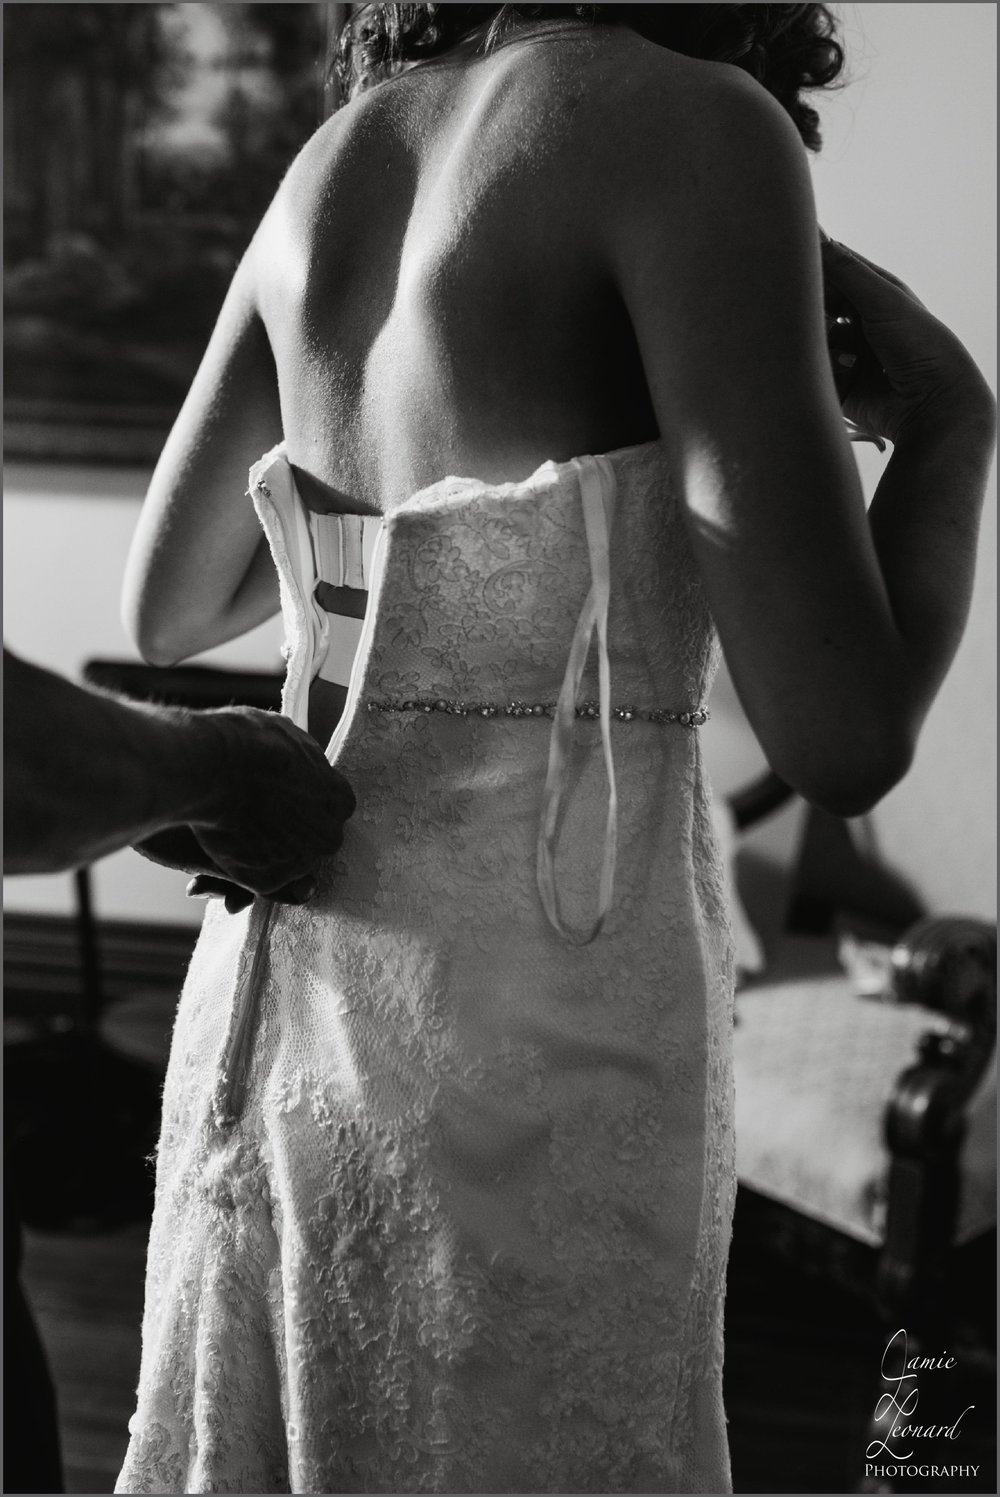 wedding_seton_hill_church_lakeview_greensburg_jamie_leonard_photography_photographer_engagement_bride_groom